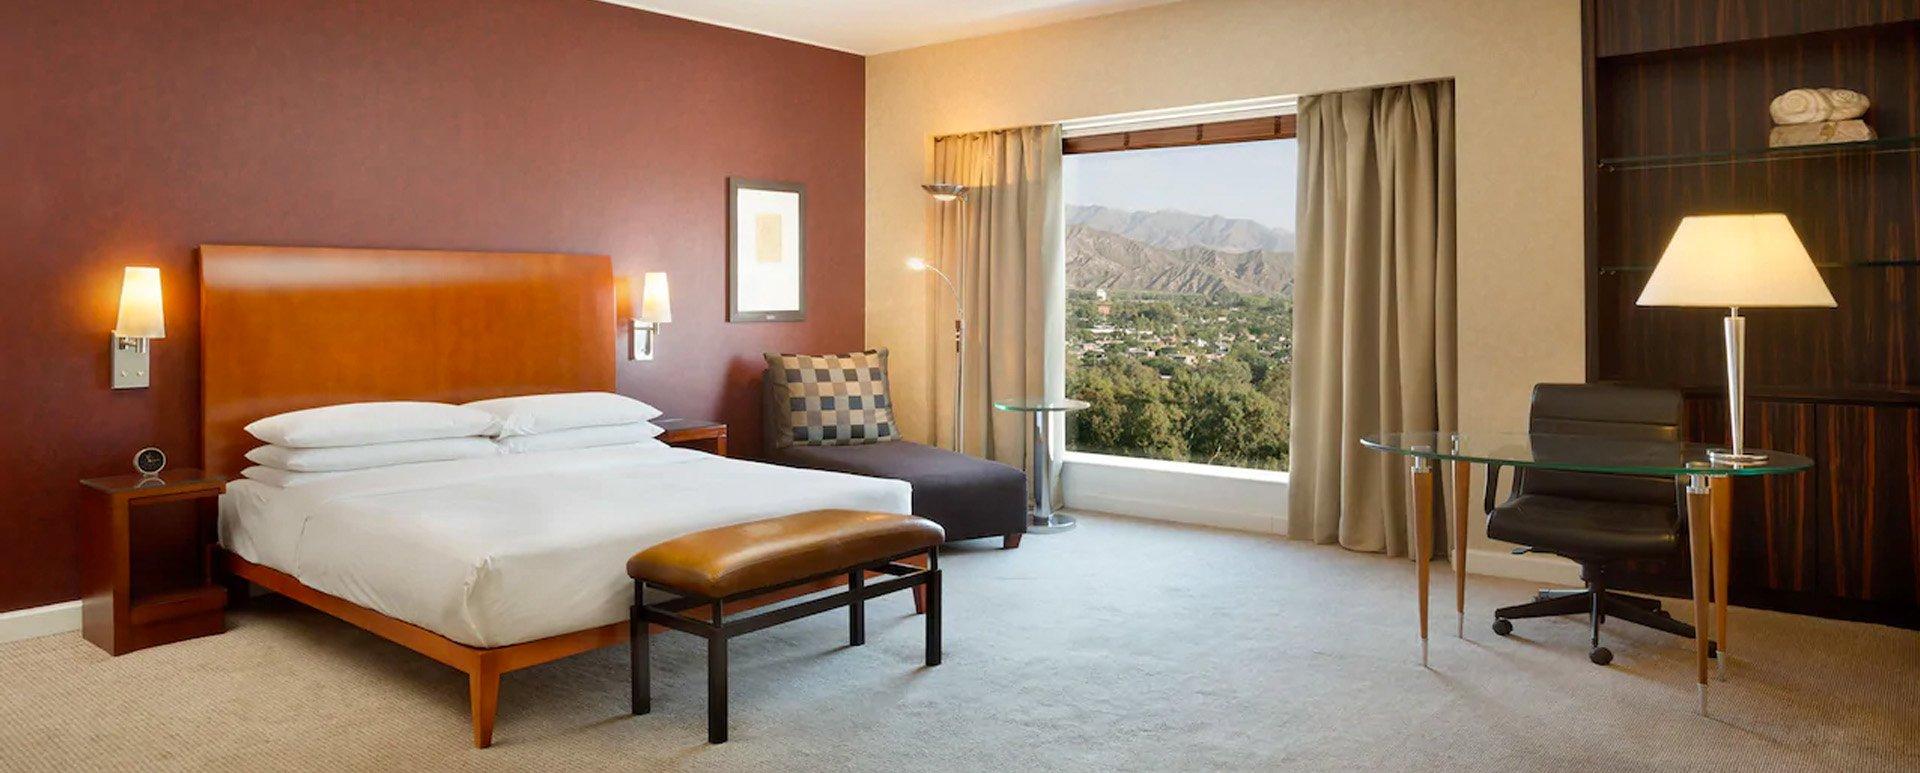 Park Hyatt hotel suite